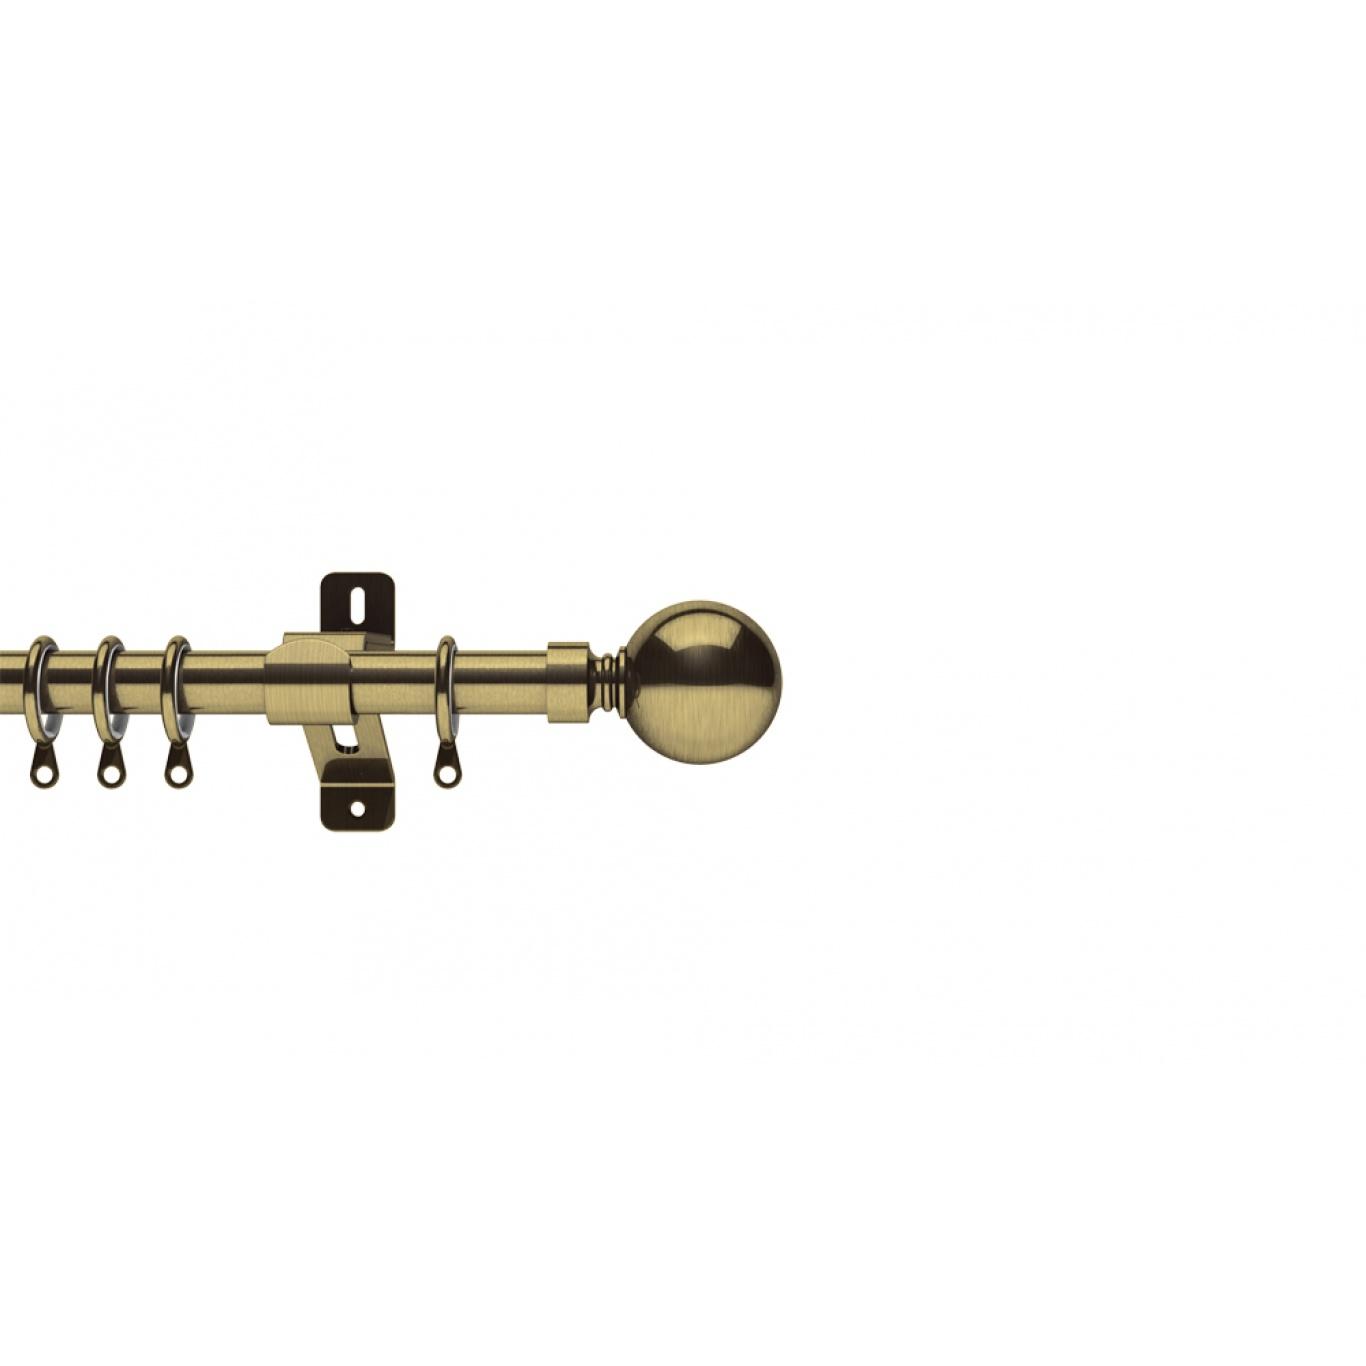 Image of Swish Belgravia 19mm Antique Brass Metal Pole